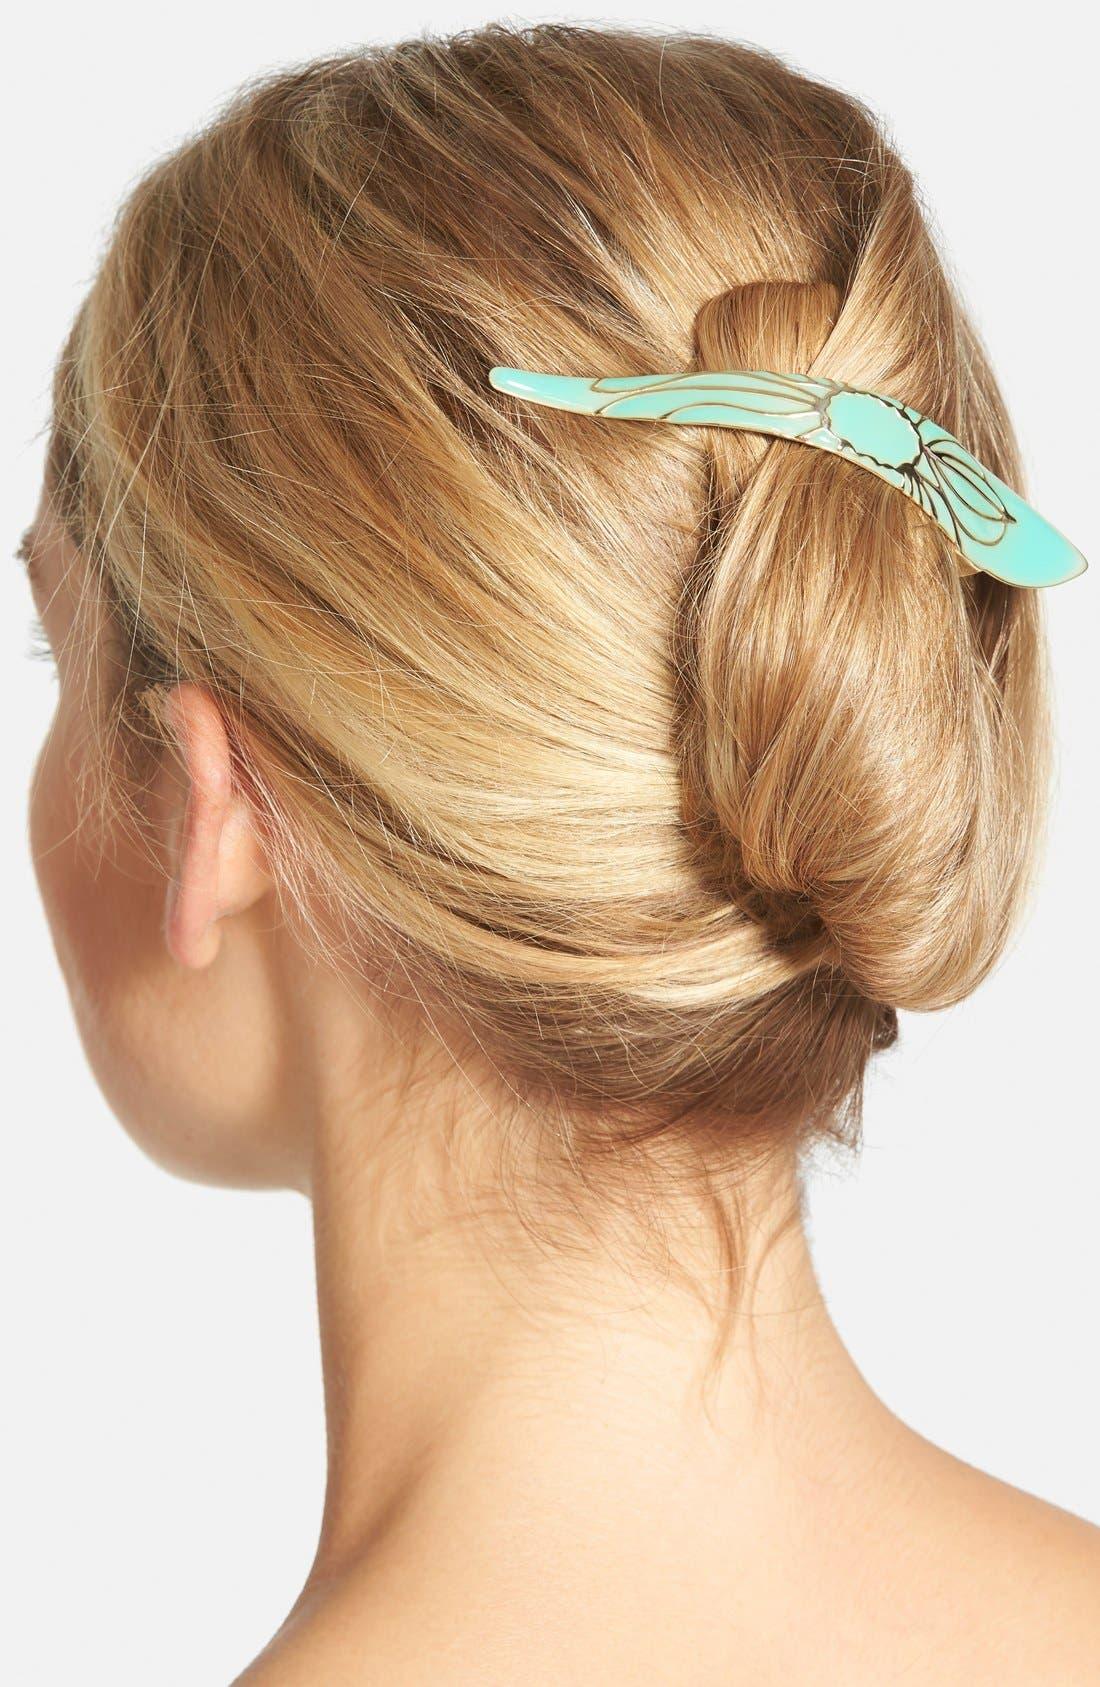 Ficcare Maximas Lotus Hair Clip